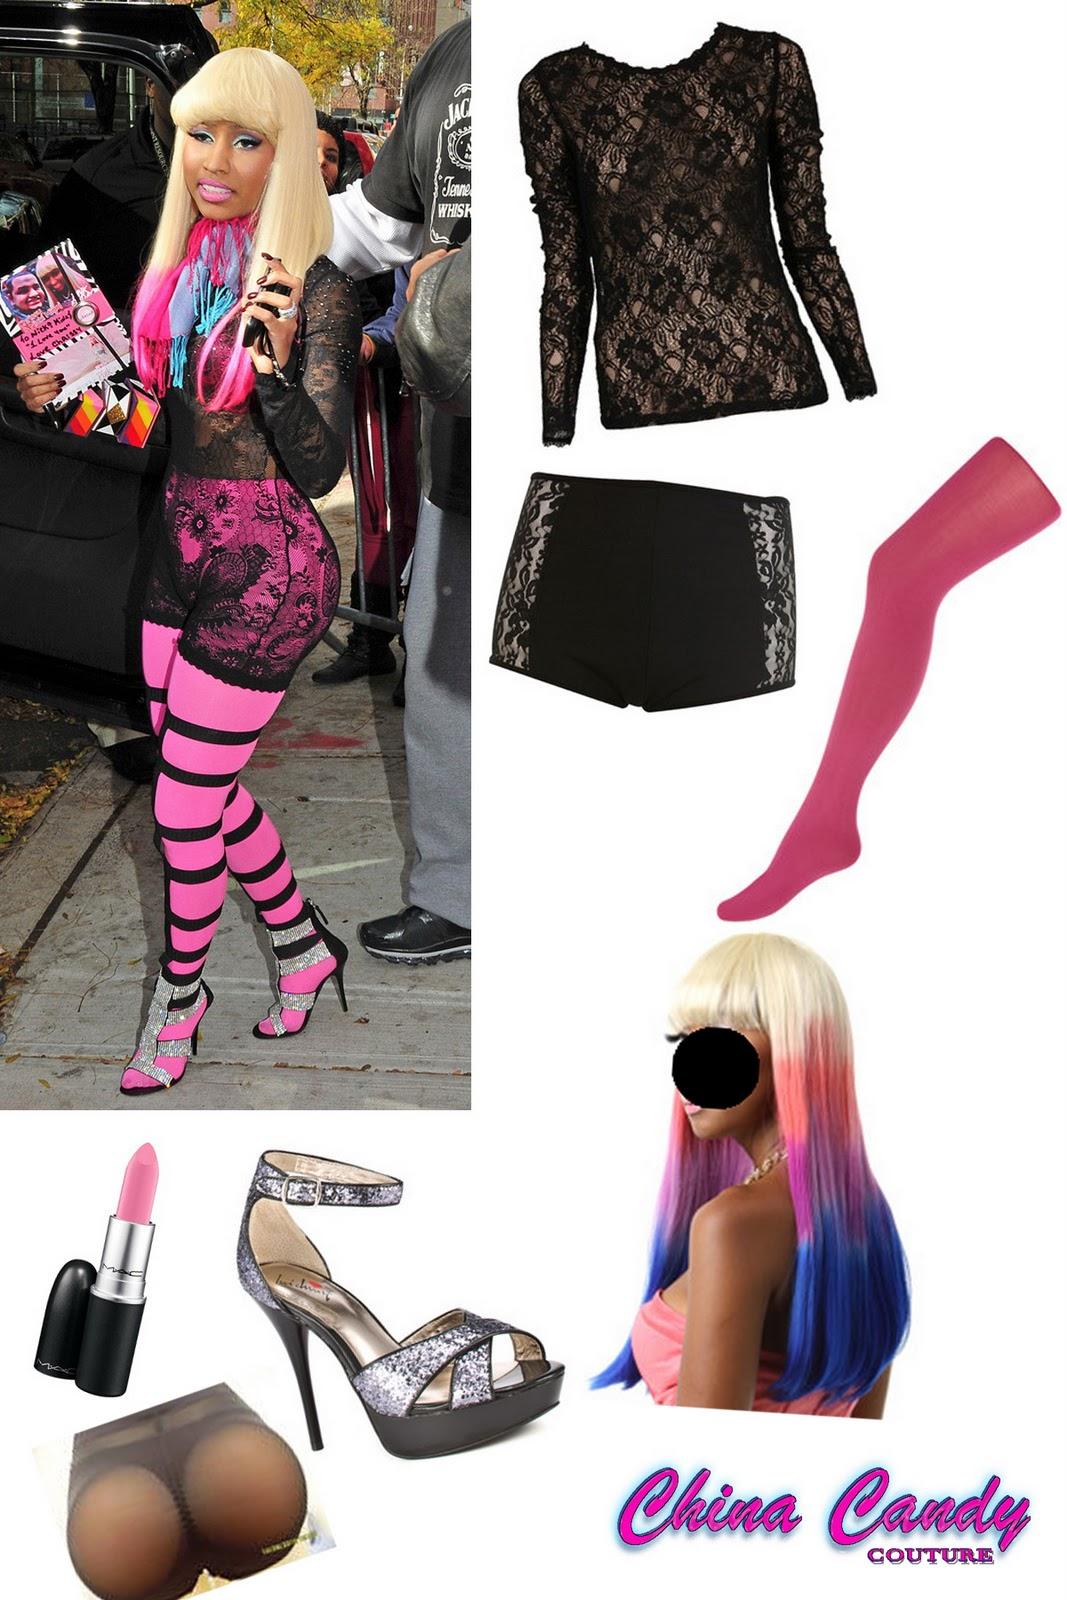 Nicki Minaj Wears See Through Tights For a nicki minaj costume,